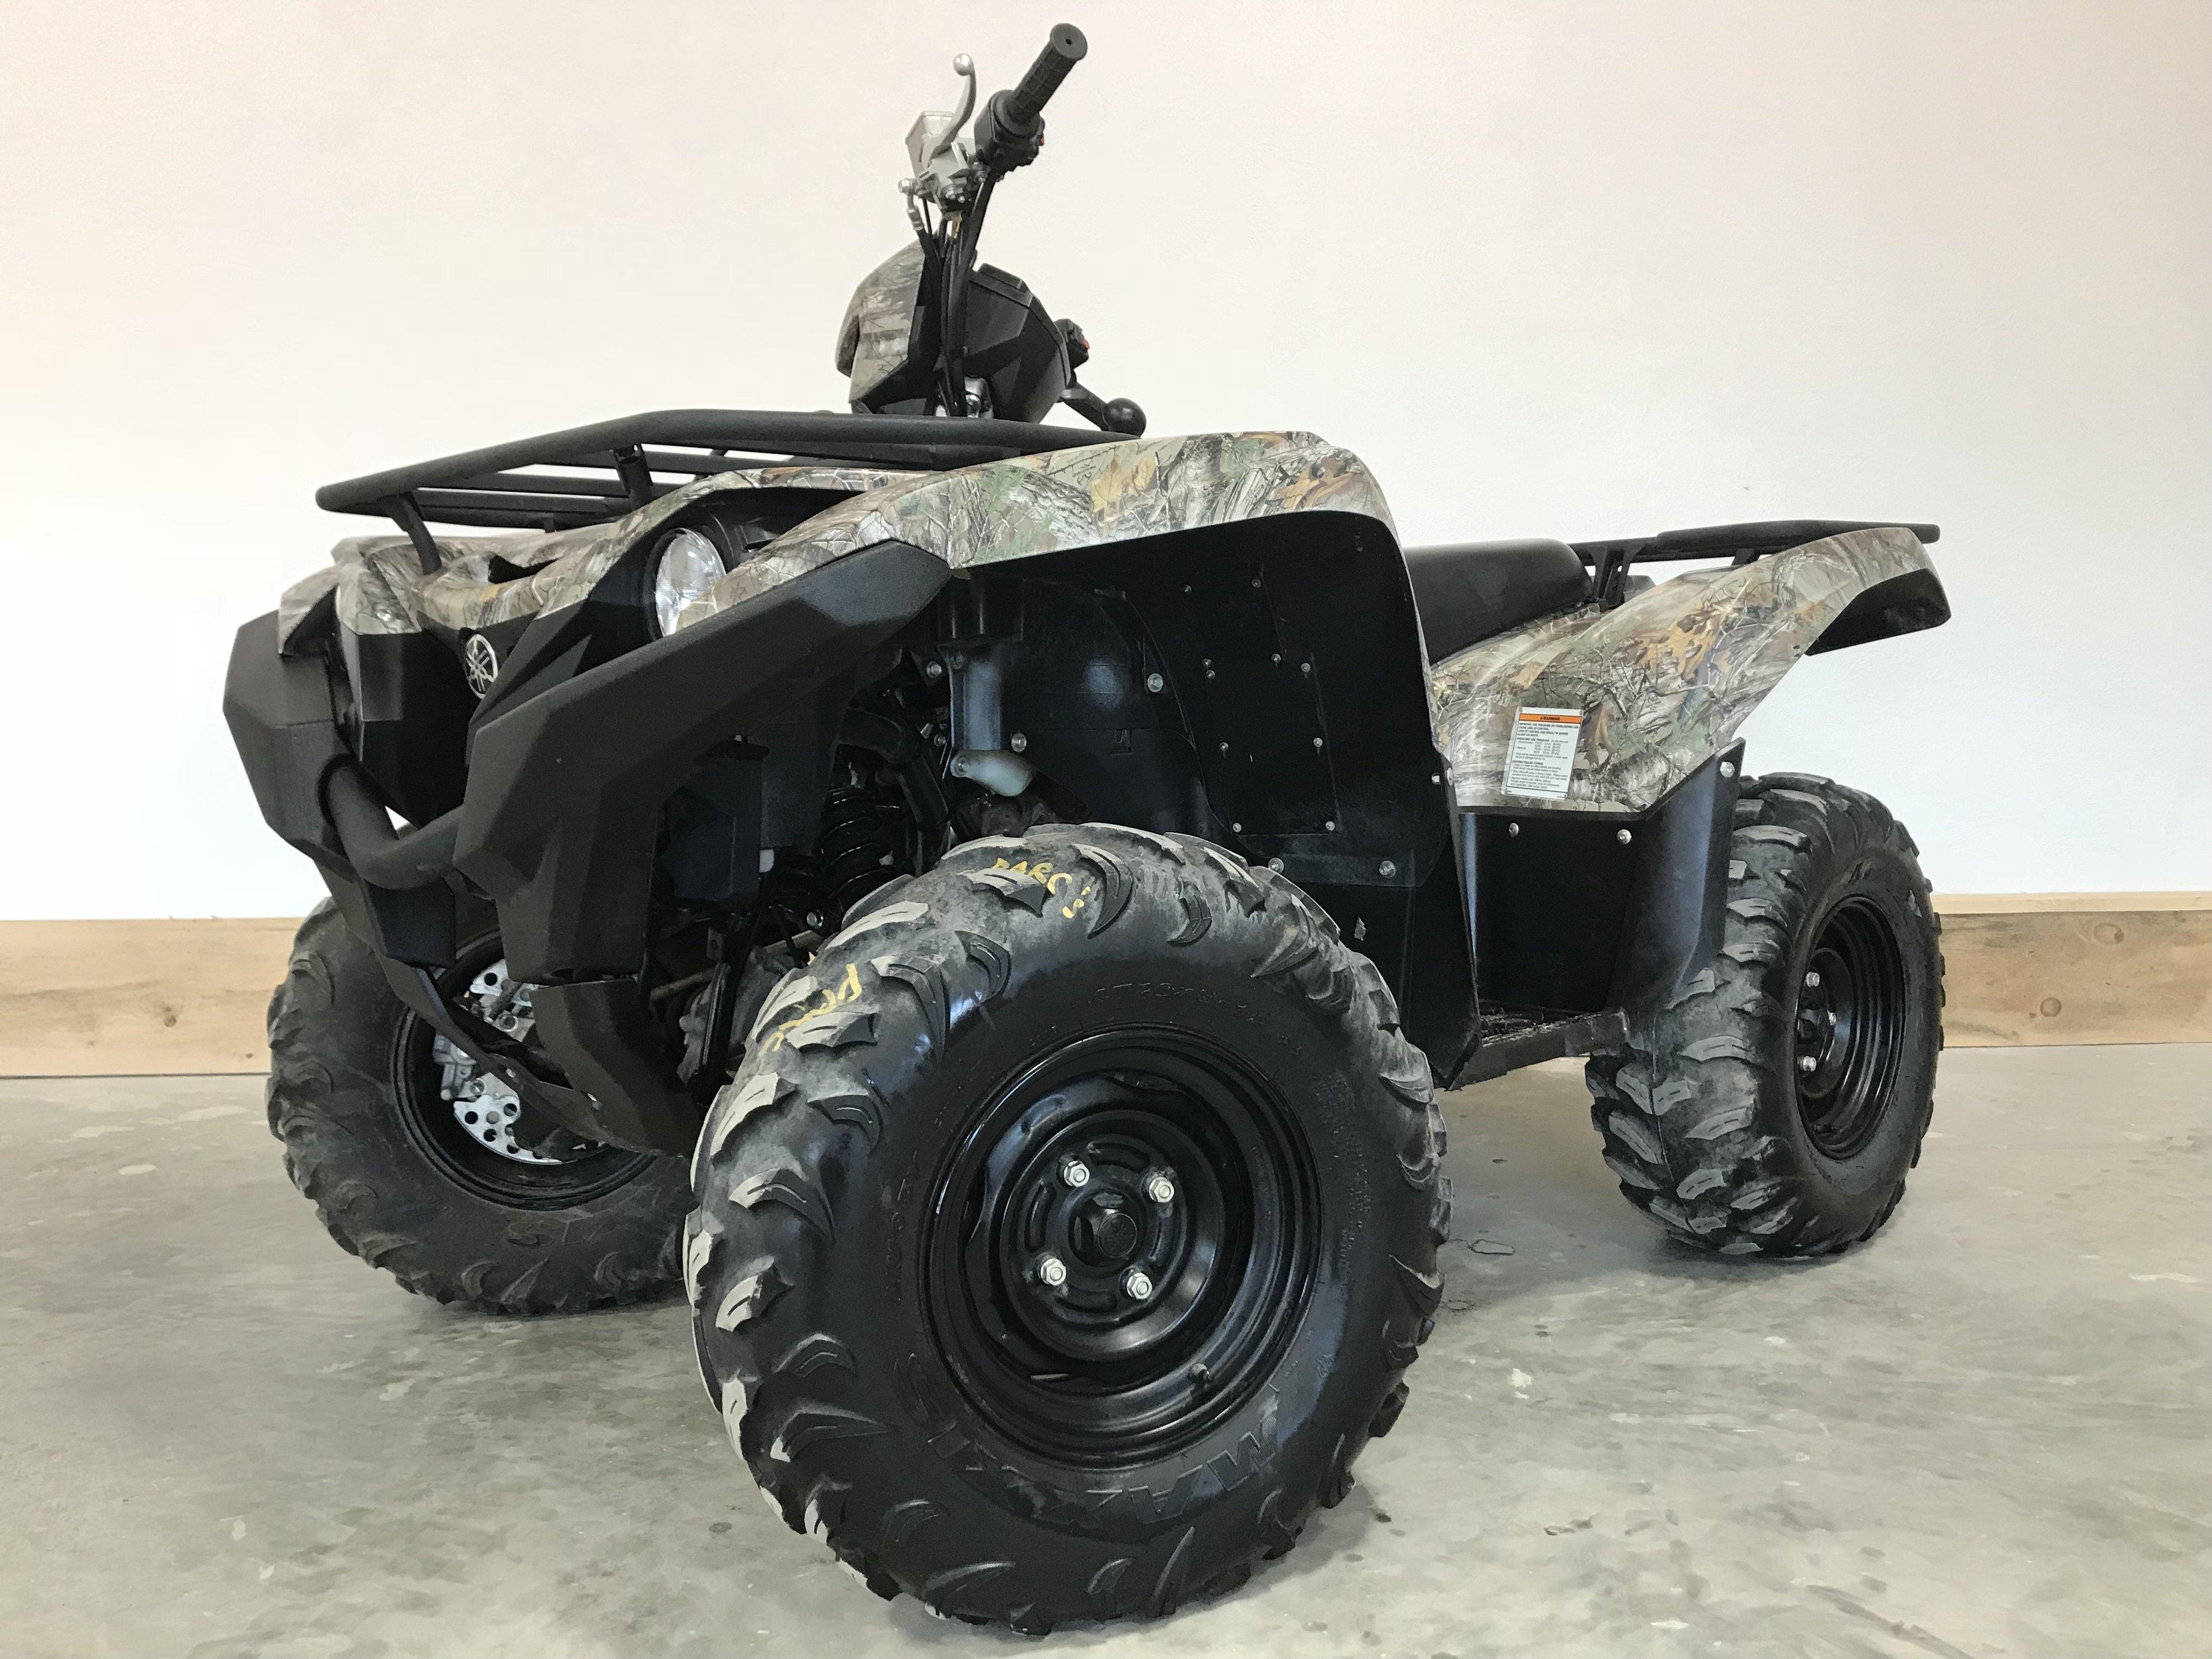 2016 Yamaha Grizzly 700 Camo EPS 79532